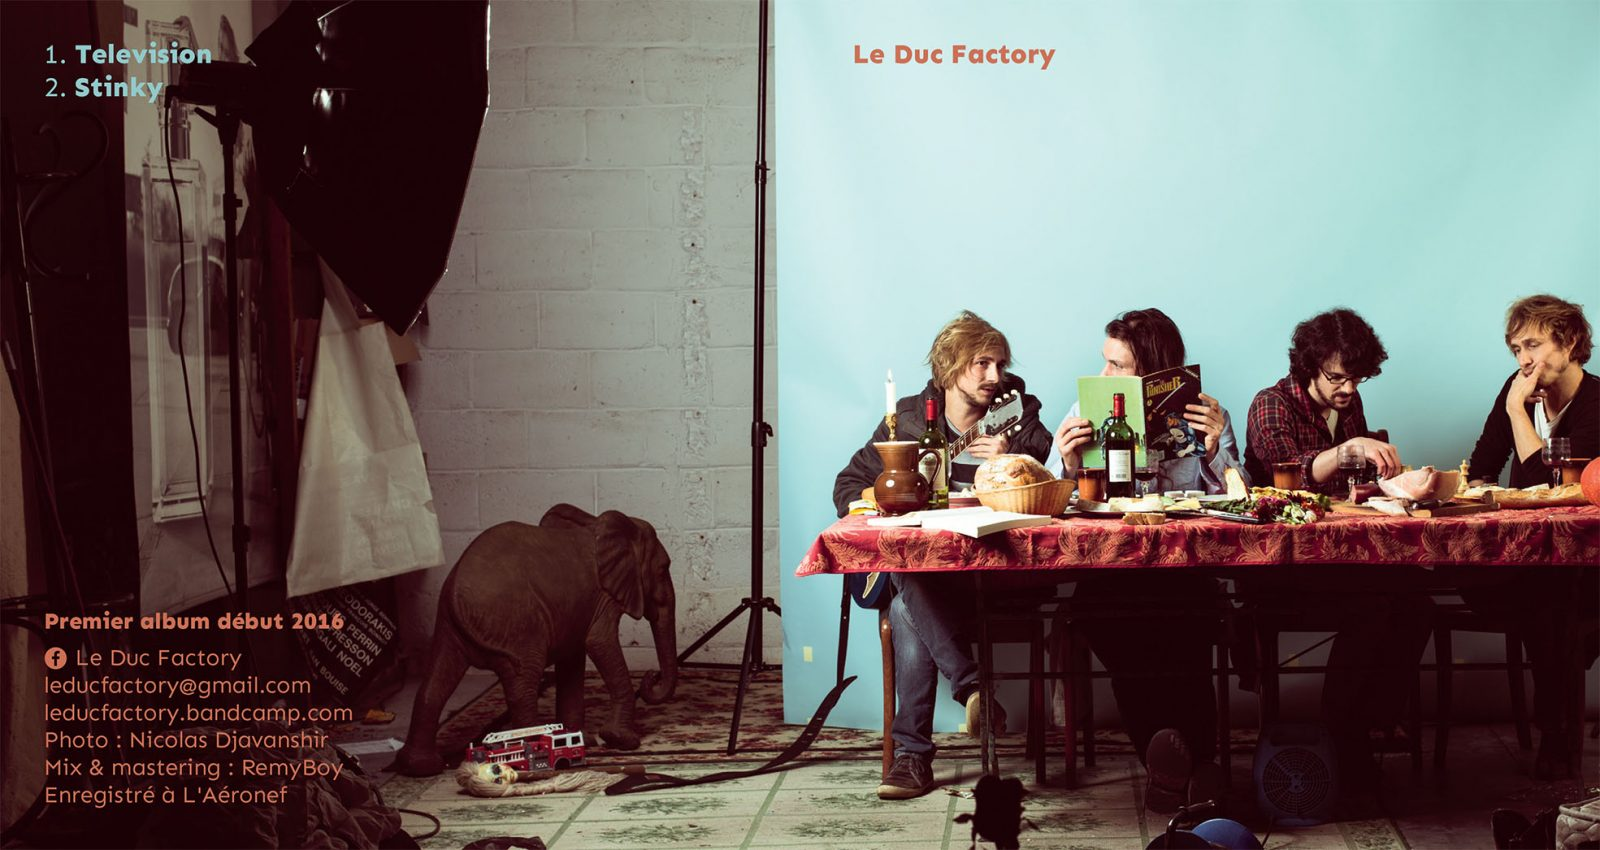 Djavanshir.n _ album cover _Le Duc Factory